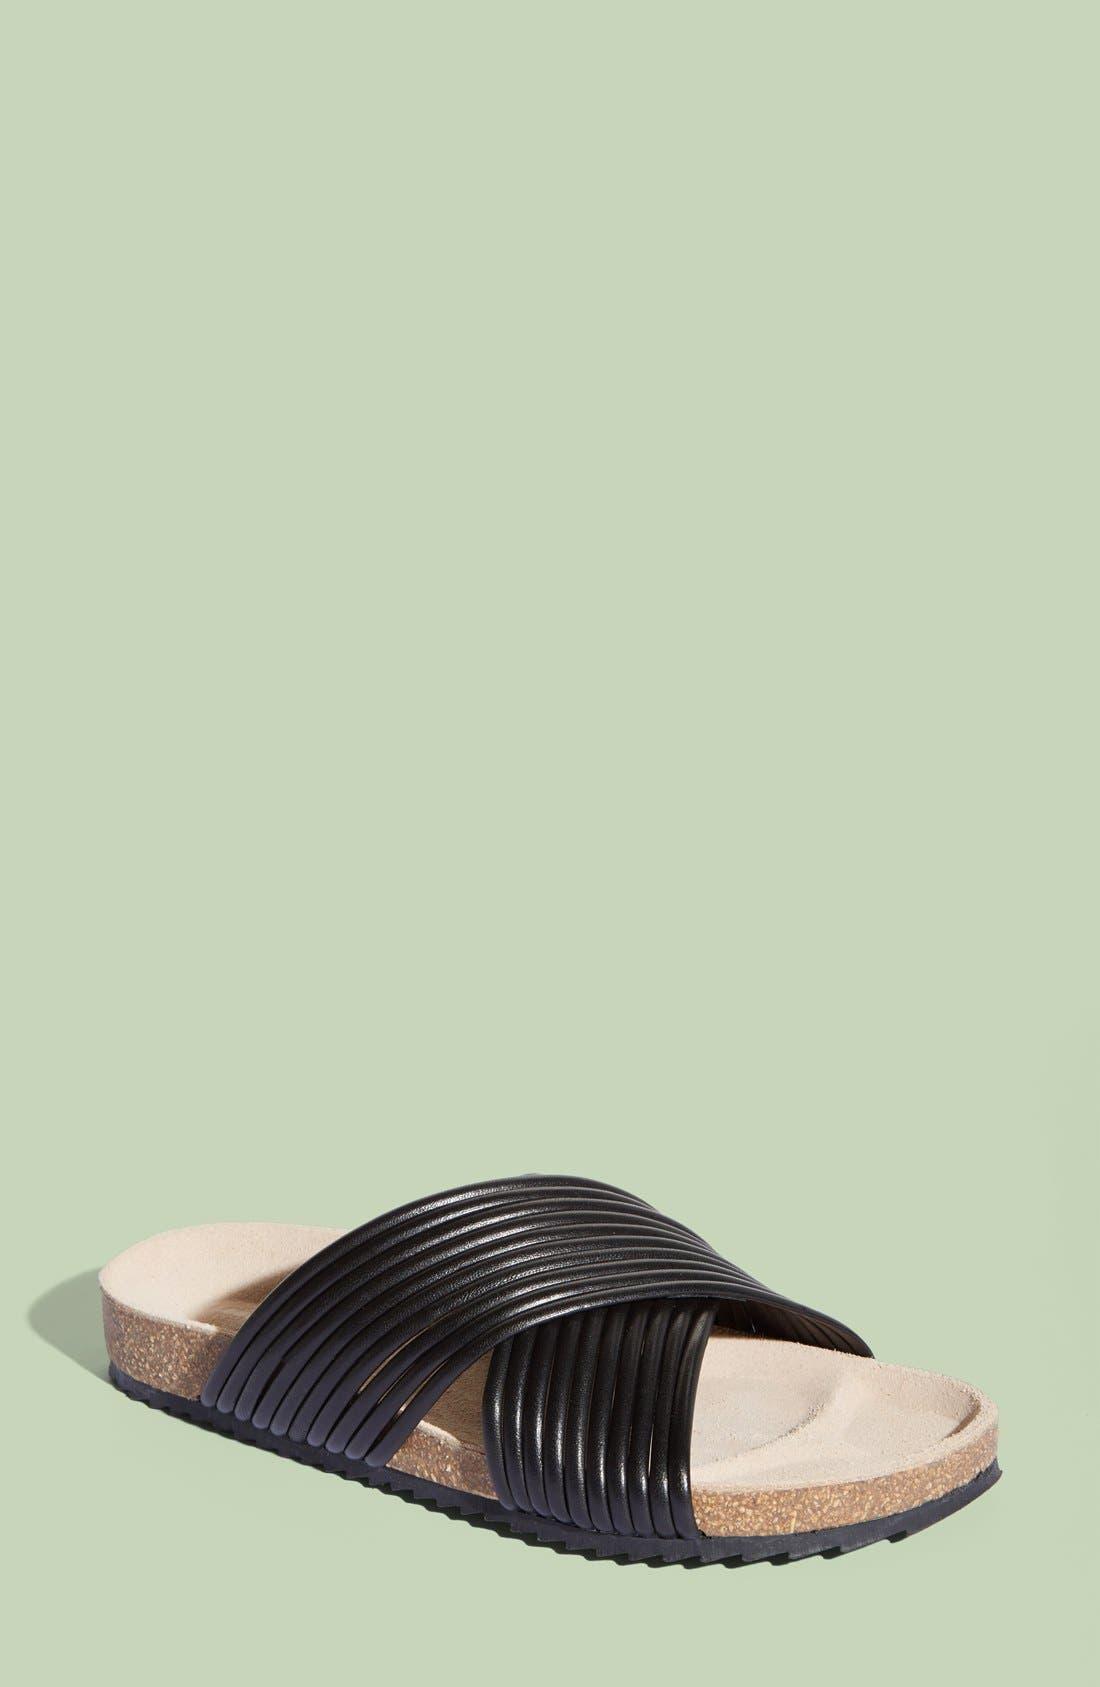 Alternate Image 1 Selected - Loeffler Randall 'Petra' Slide Footbed Sandal (Women)